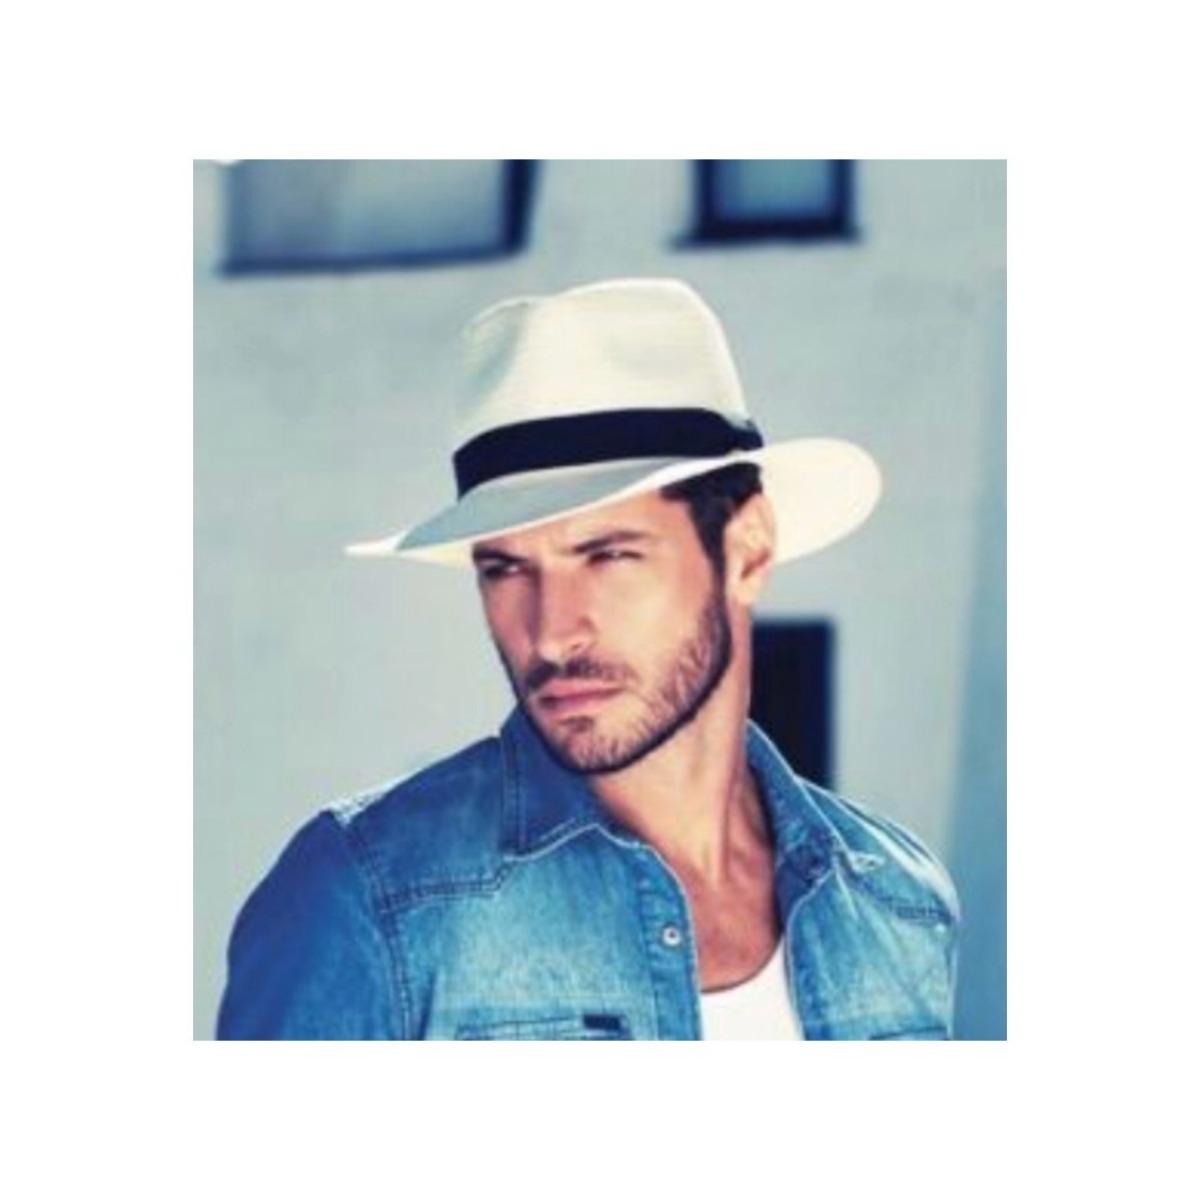 Chapéu Estilo Panamá Masculino Feminino Modelo Clássico Moda - R  59 ... 73211535f45